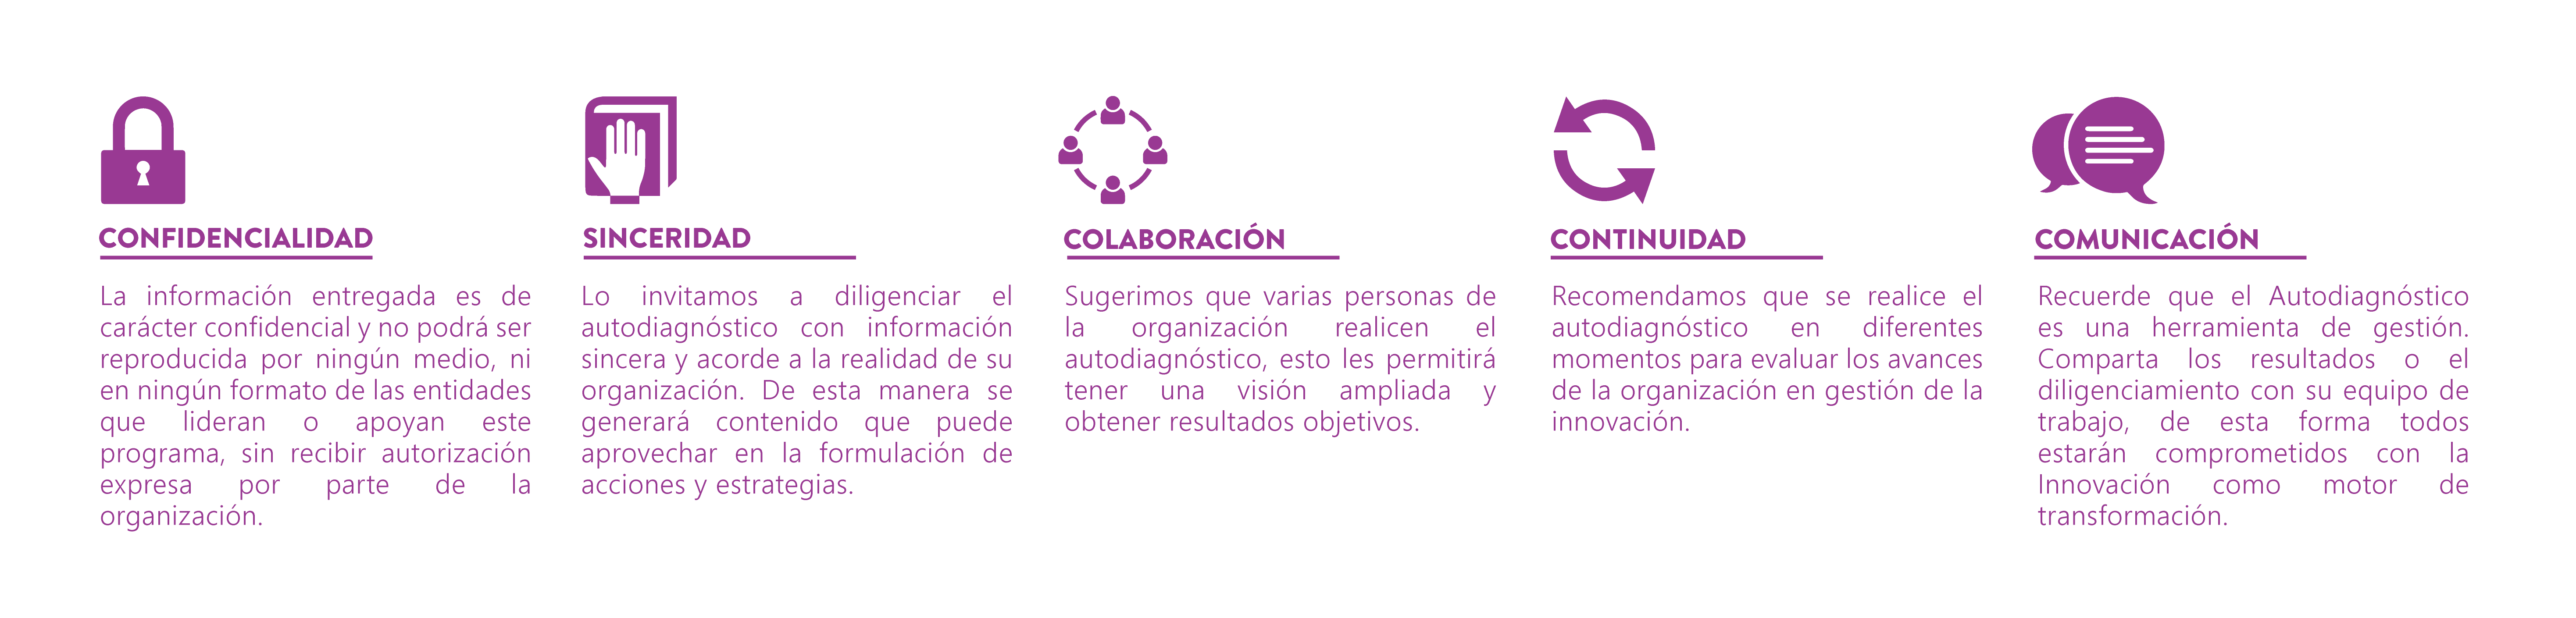 http://pactosporlainnovacion.colciencias.gov.co/wp-content/uploads/2016/05/Valores-tenga-en-cuenta.png